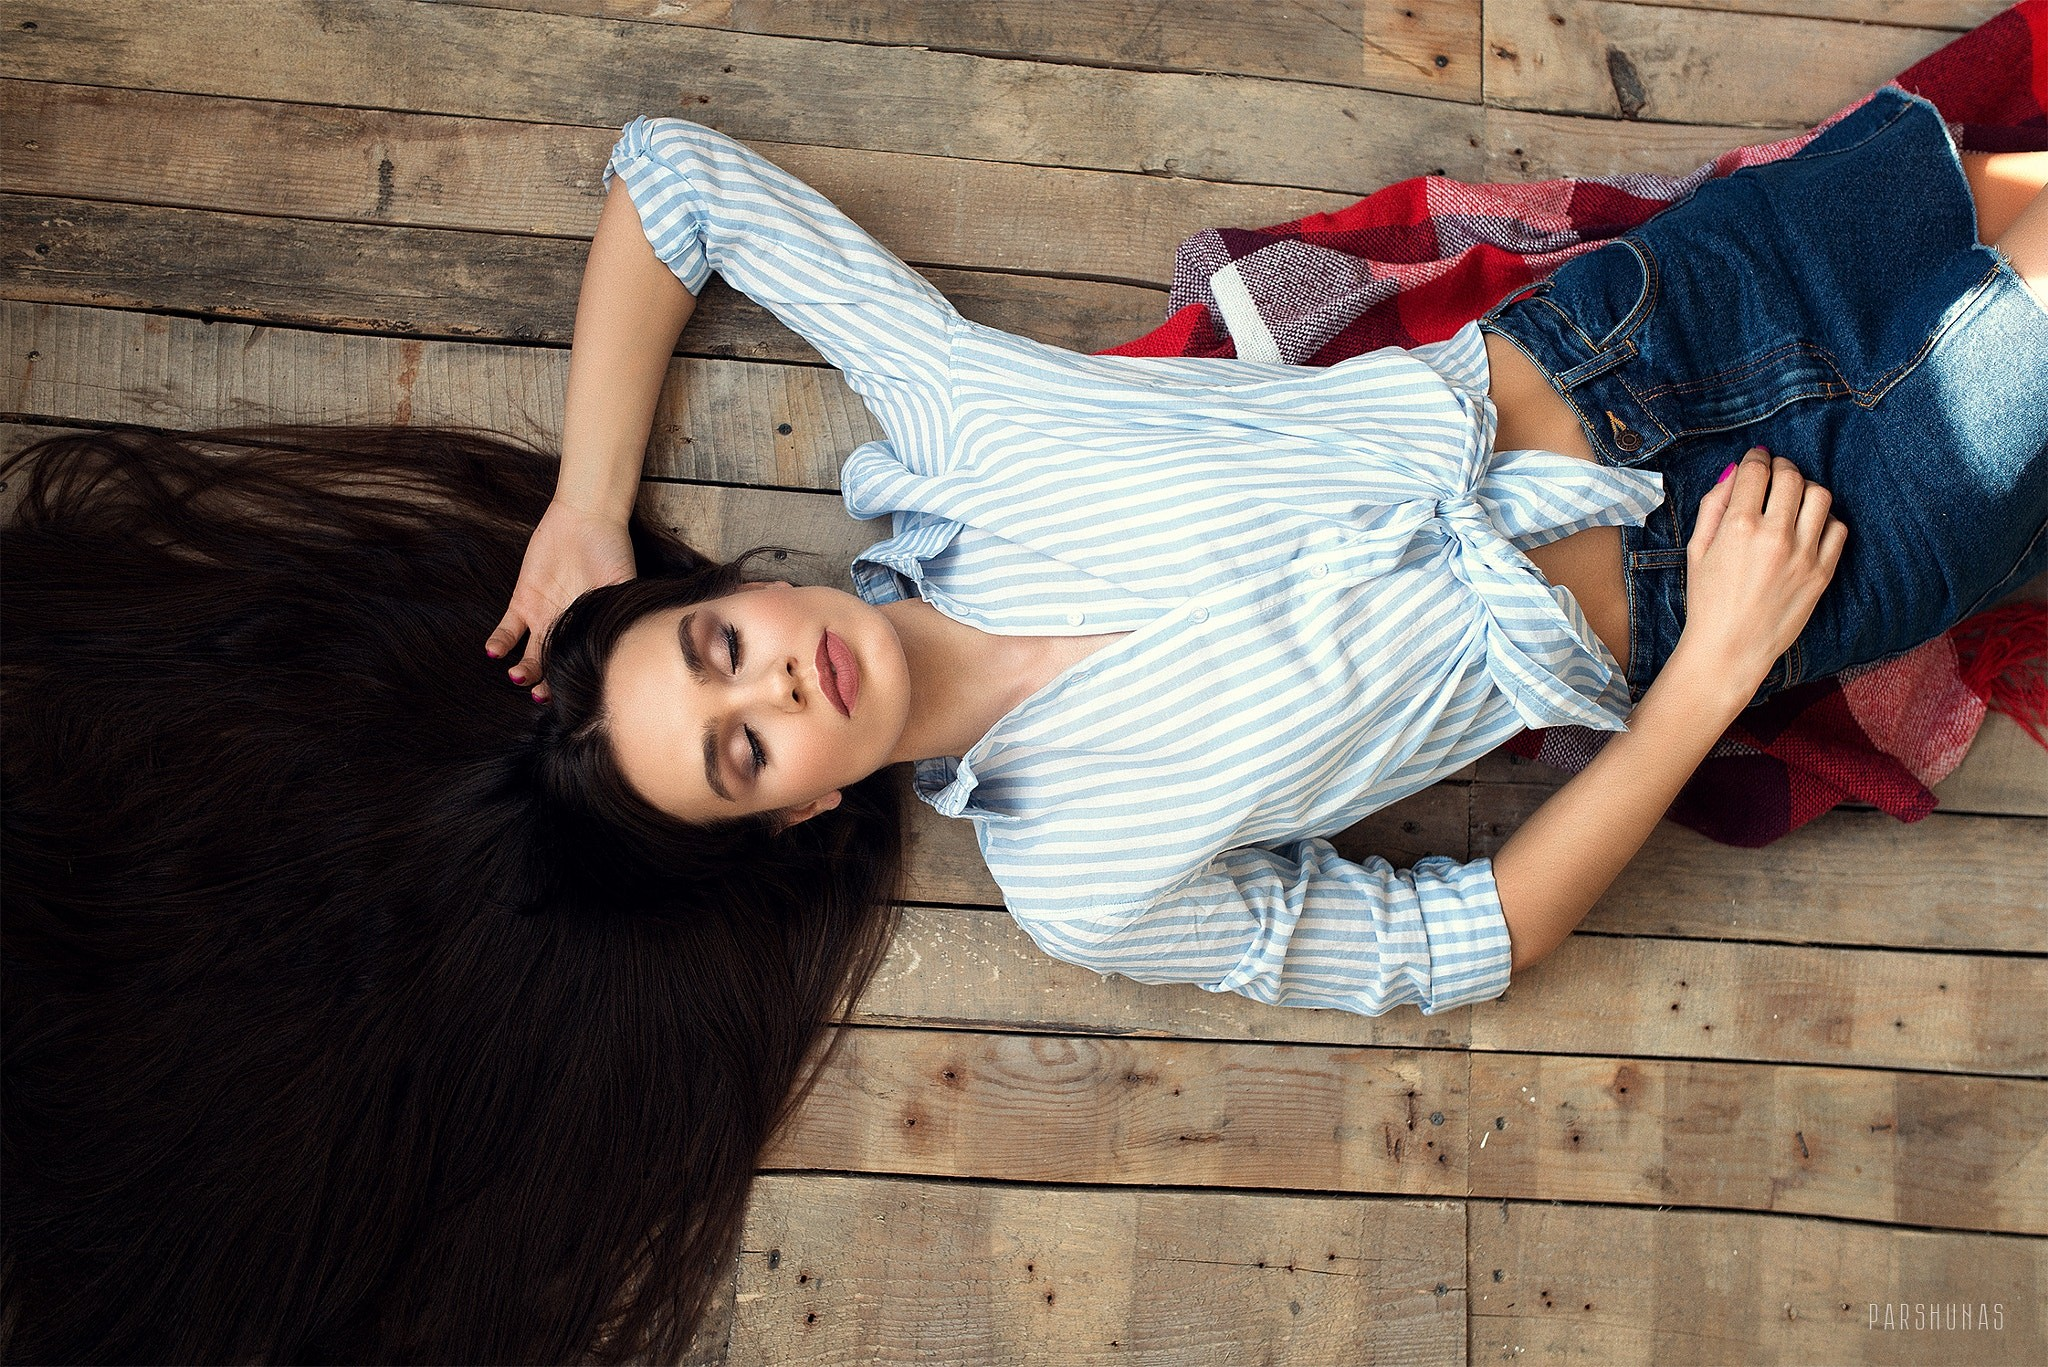 People 2048x1367 Anton Parshunas women model long hair brunette closed eyes lying down shirt Tied top